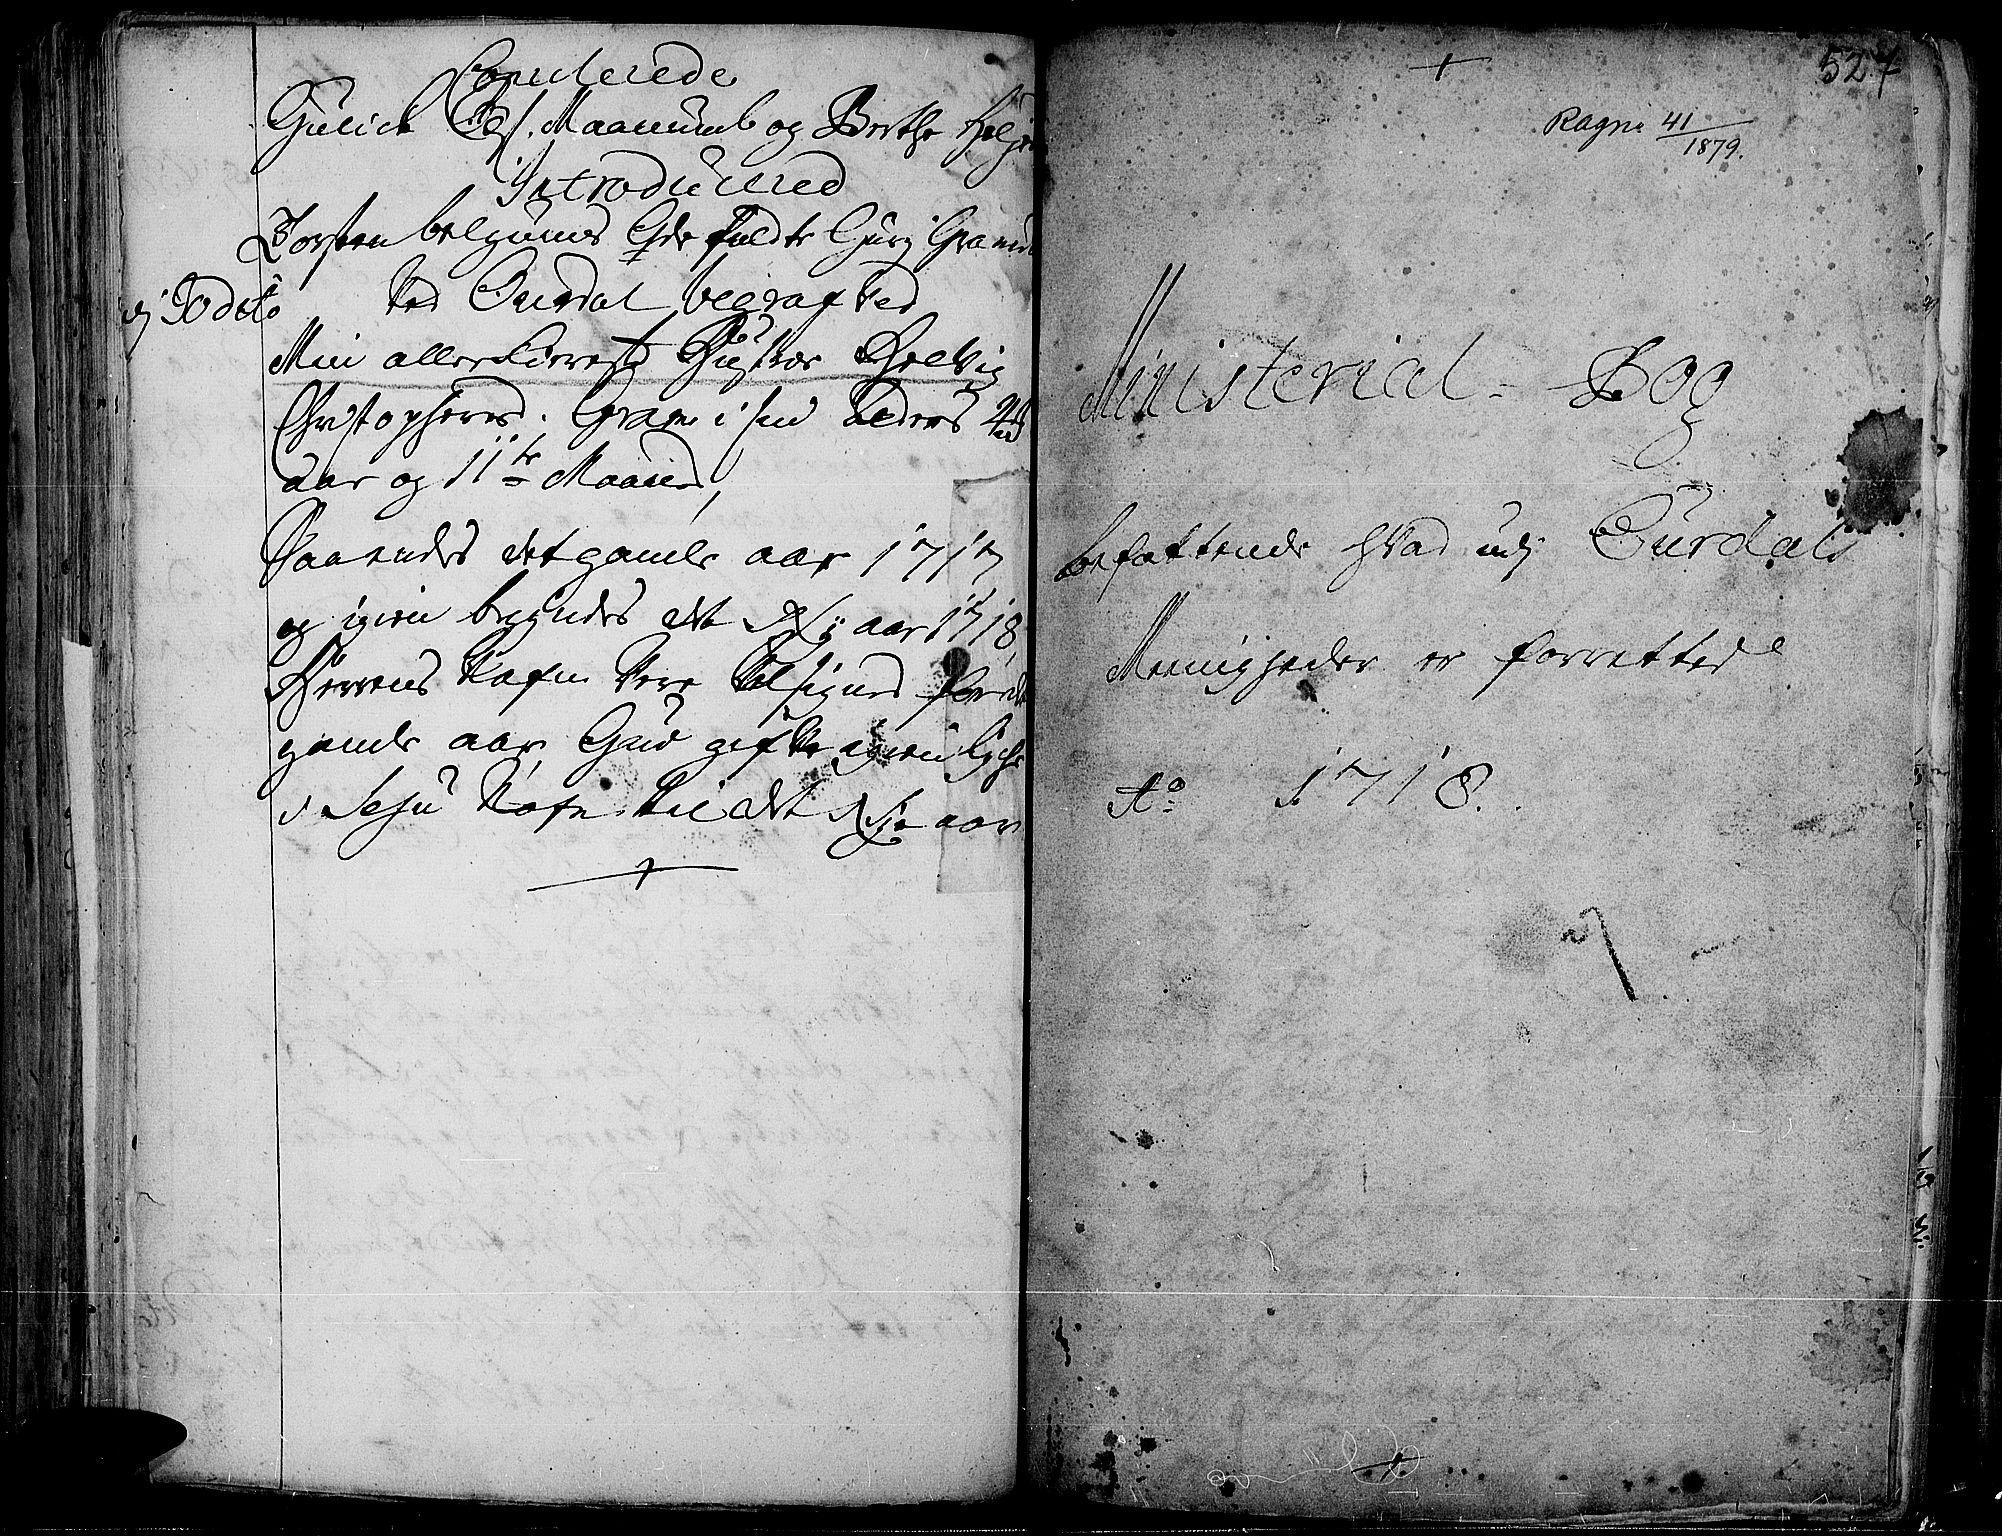 SAH, Aurdal prestekontor, Ministerialbok nr. 1-3, 1692-1730, s. 527